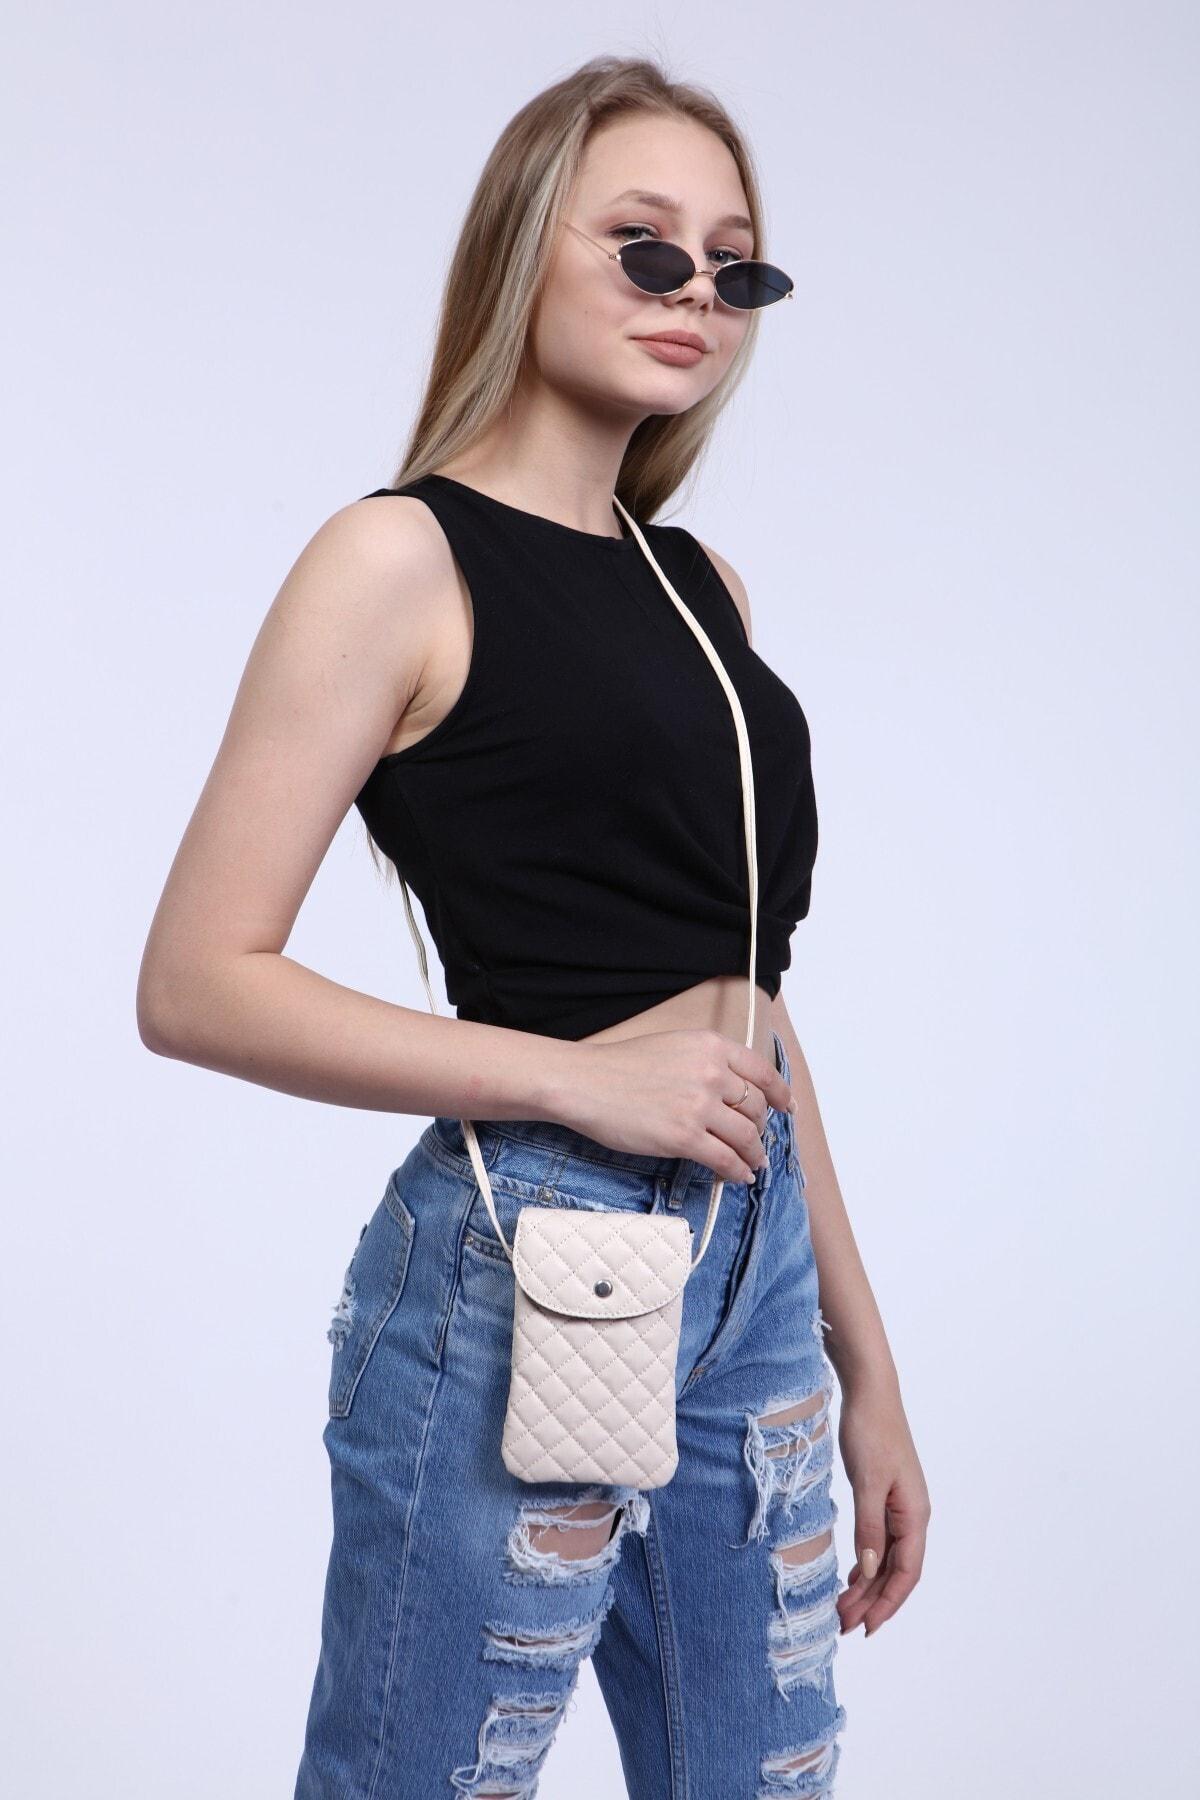 For women Mink Color Quilted Fabric, Strap Mobile Phone for Shoulder Bag